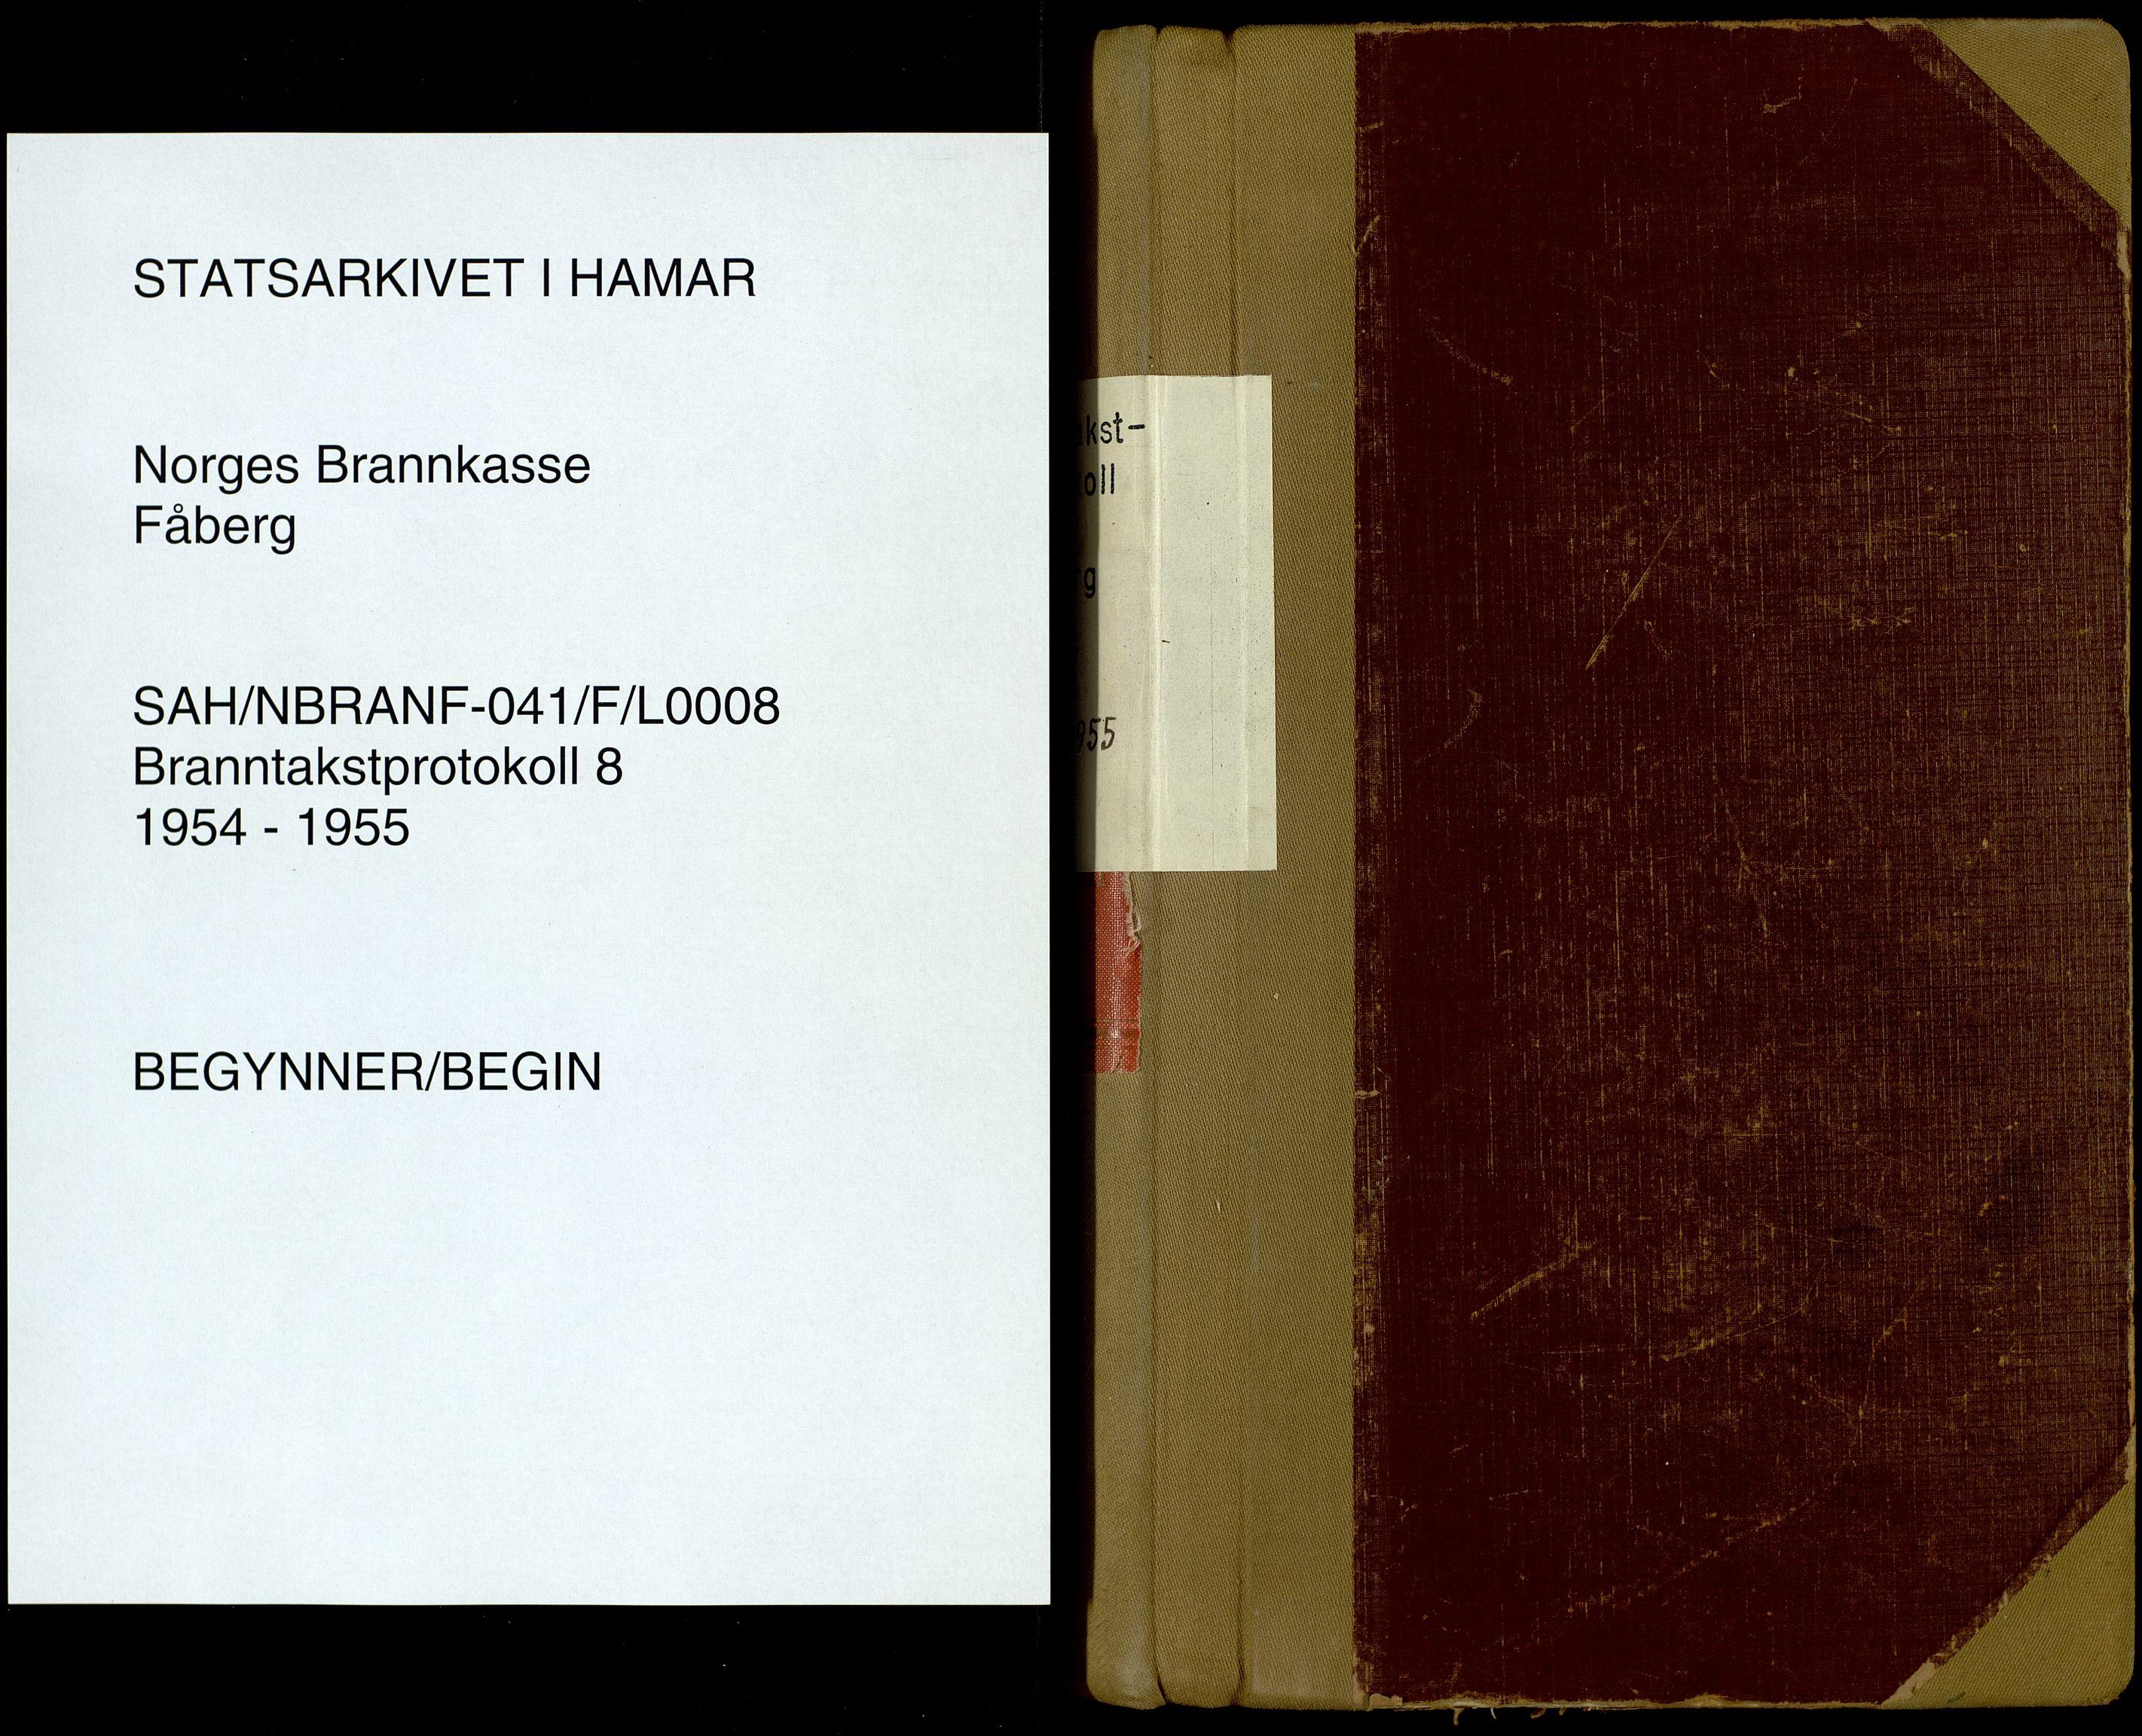 SAH, Norges Brannkasse, Fåberg, F/L0008: Branntakstprotokoll, 1954-1955